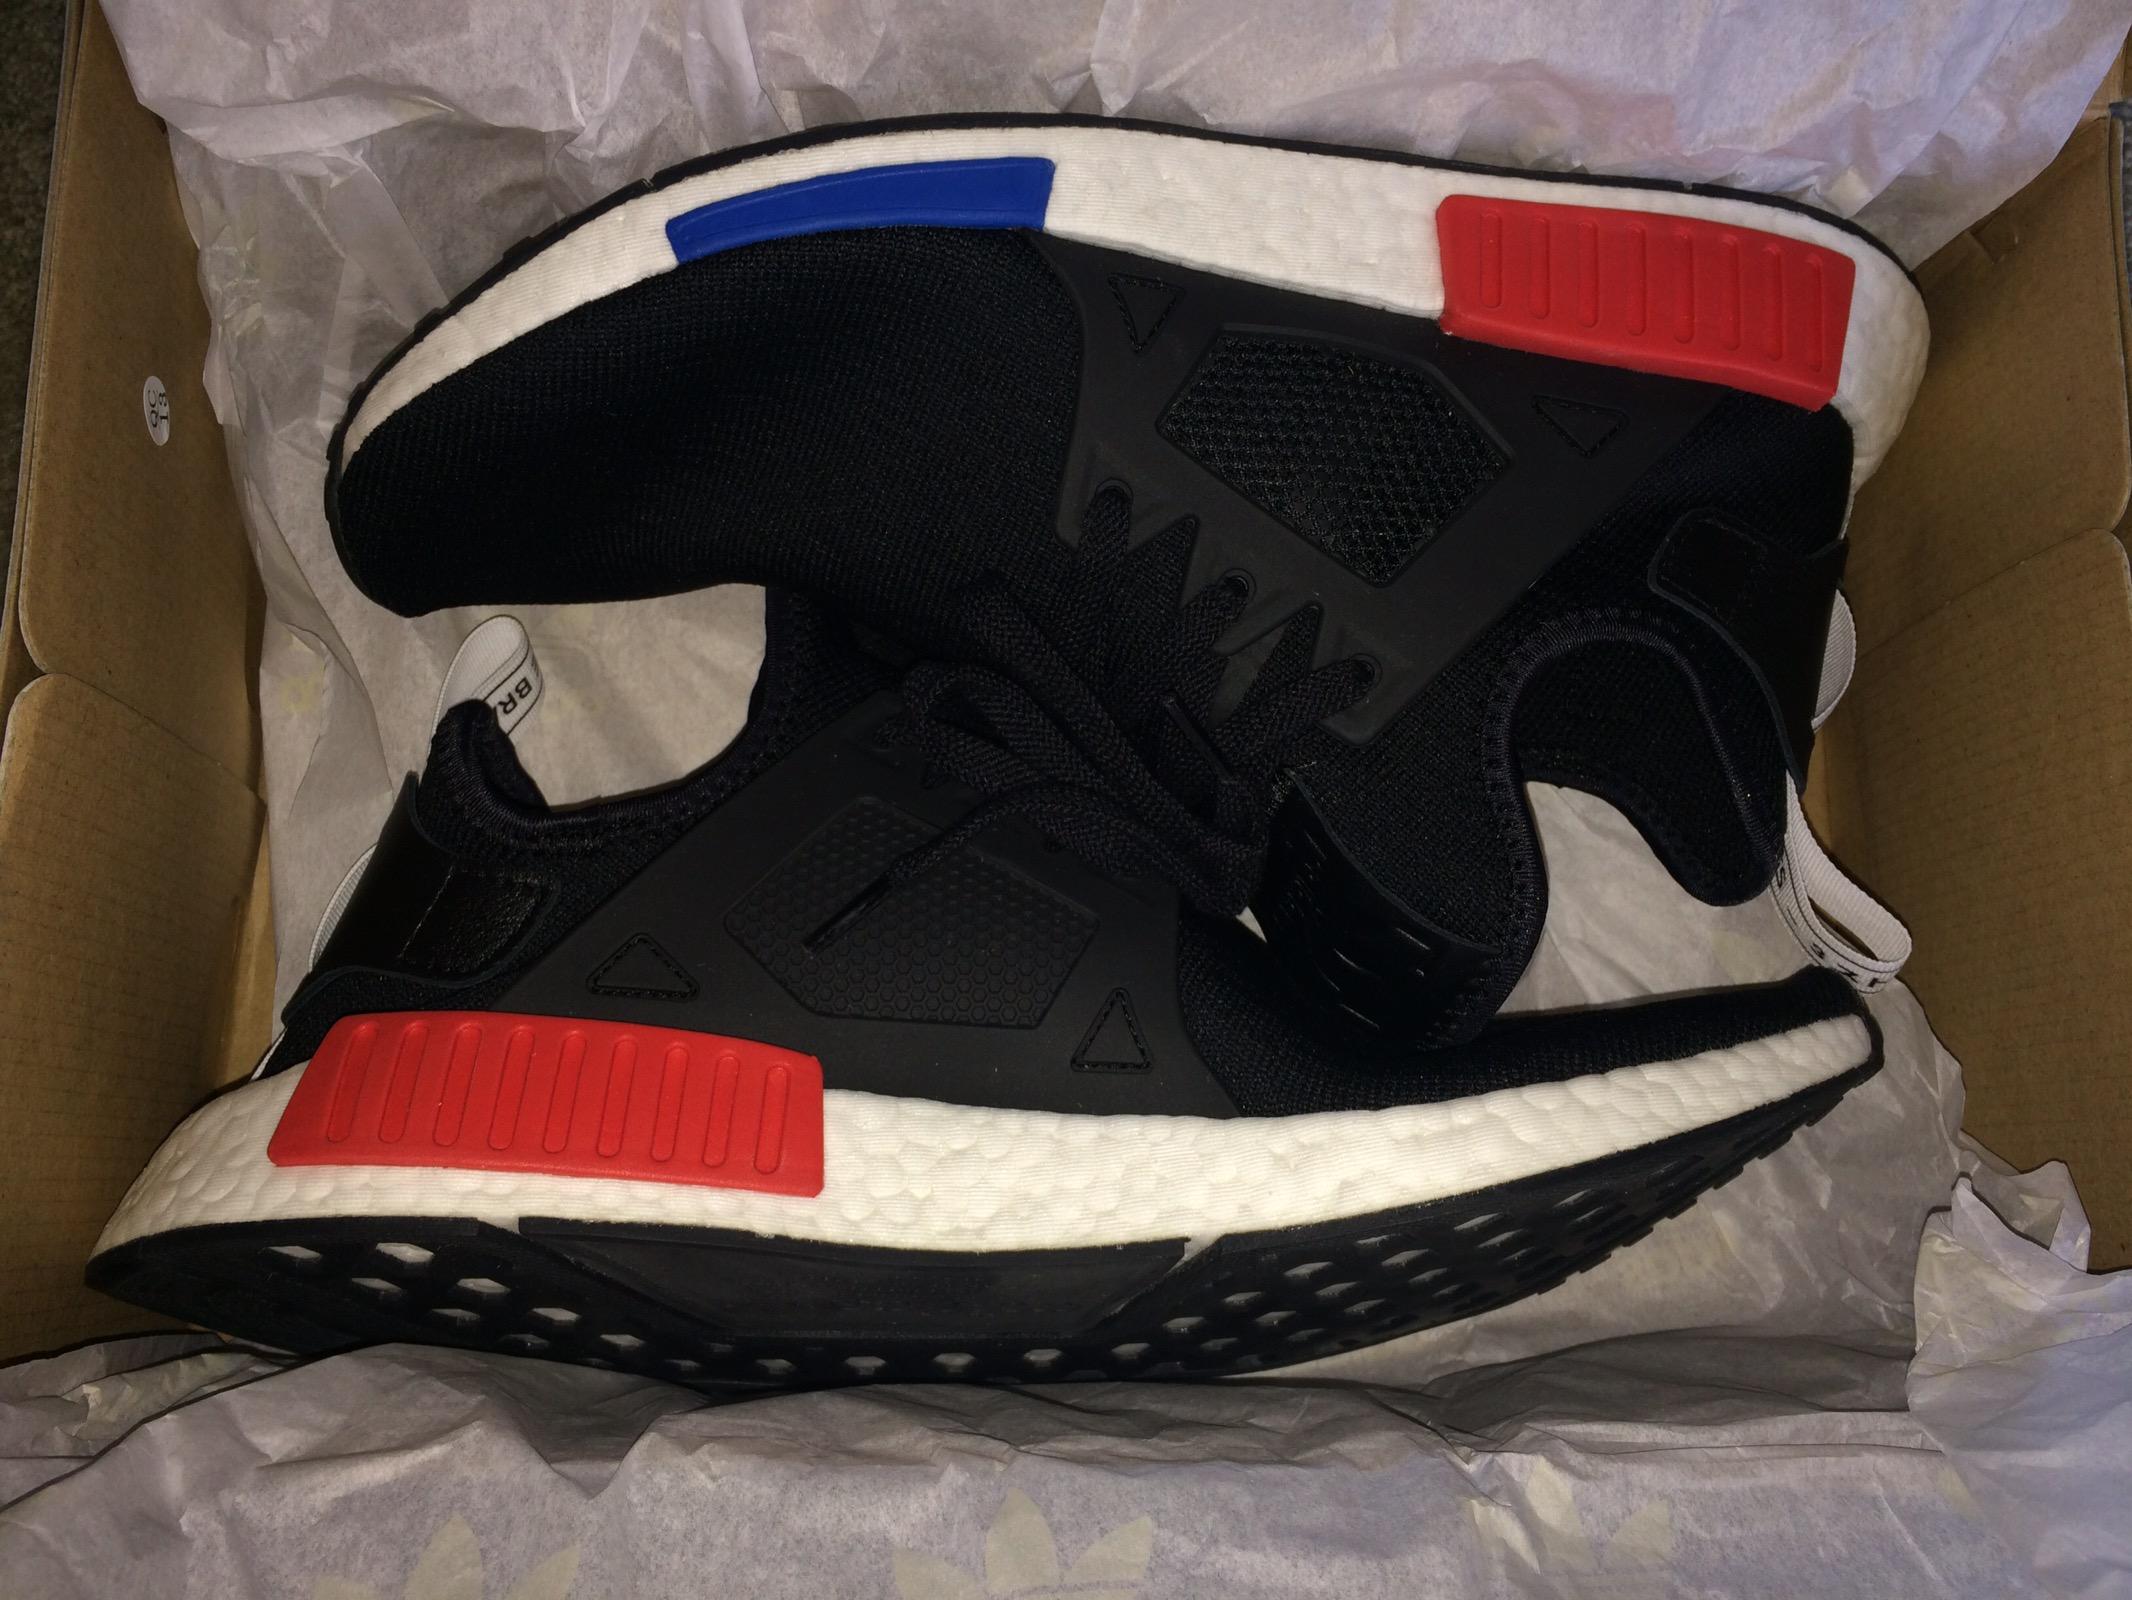 Adidas Nmd Xr1 Pk Og Colorway Grailed